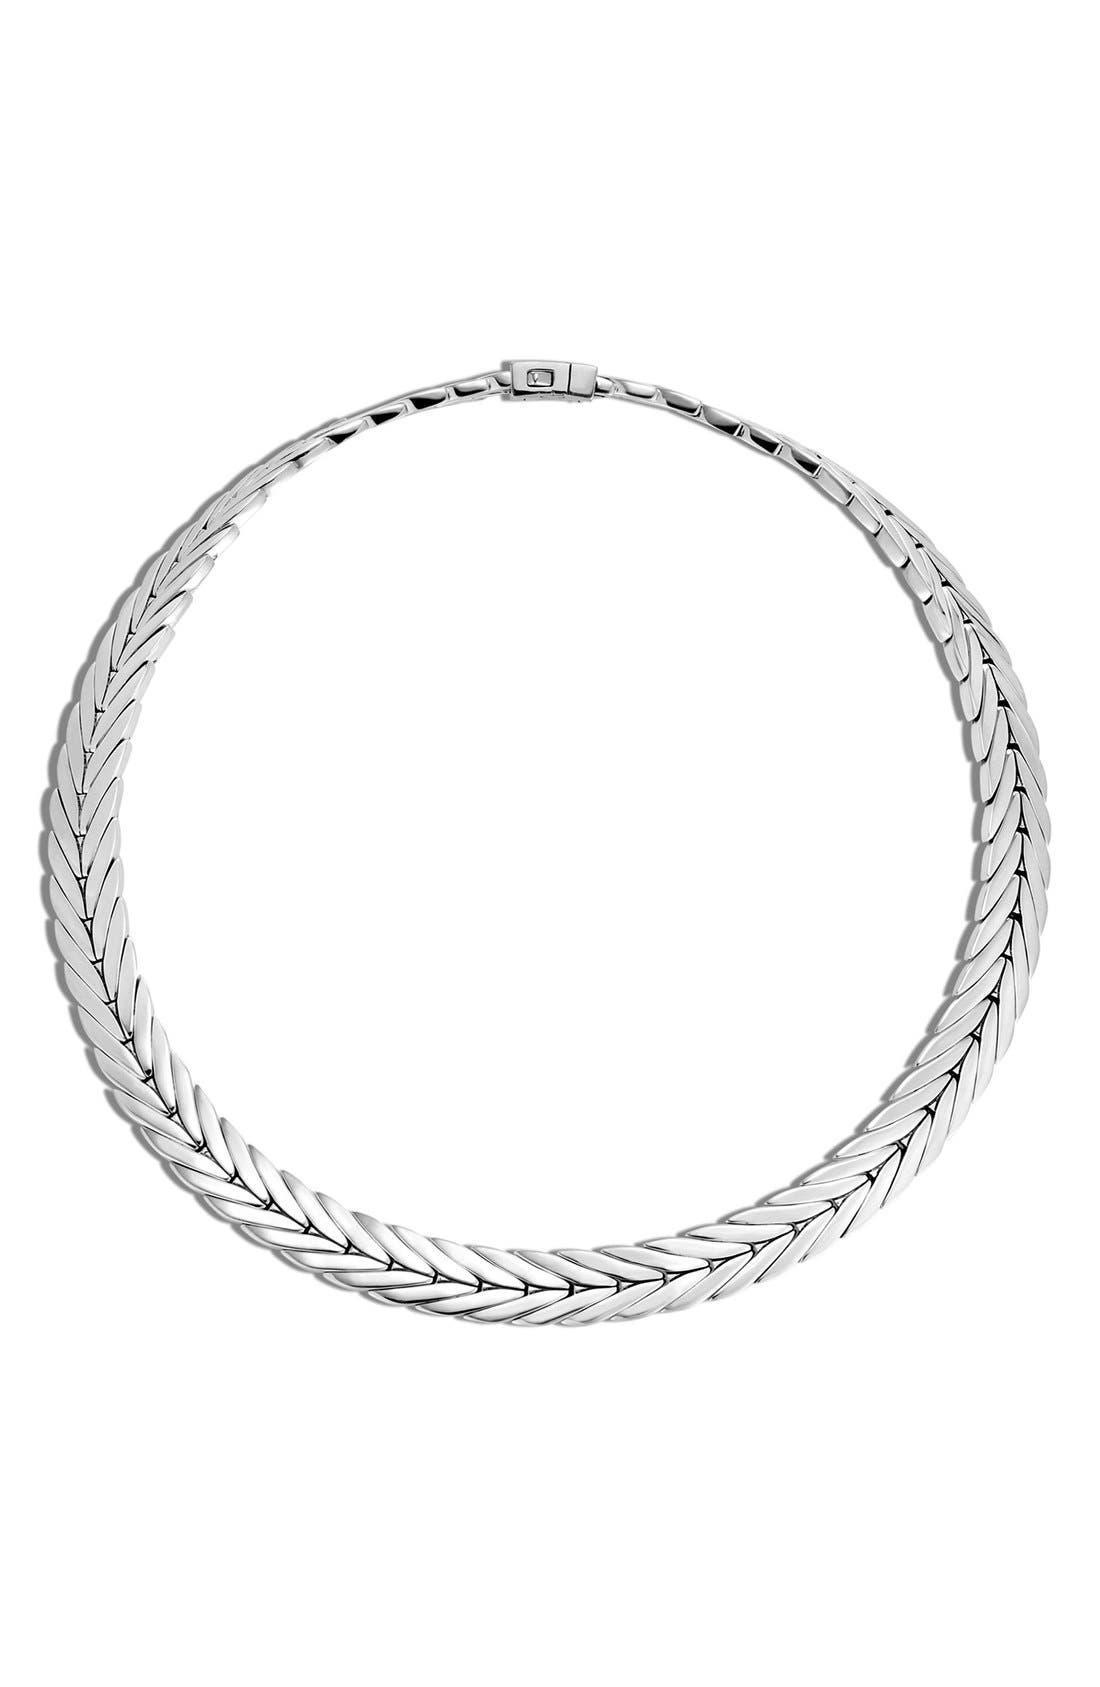 John Hardy 'Classic Chain' Chain Collar Necklace